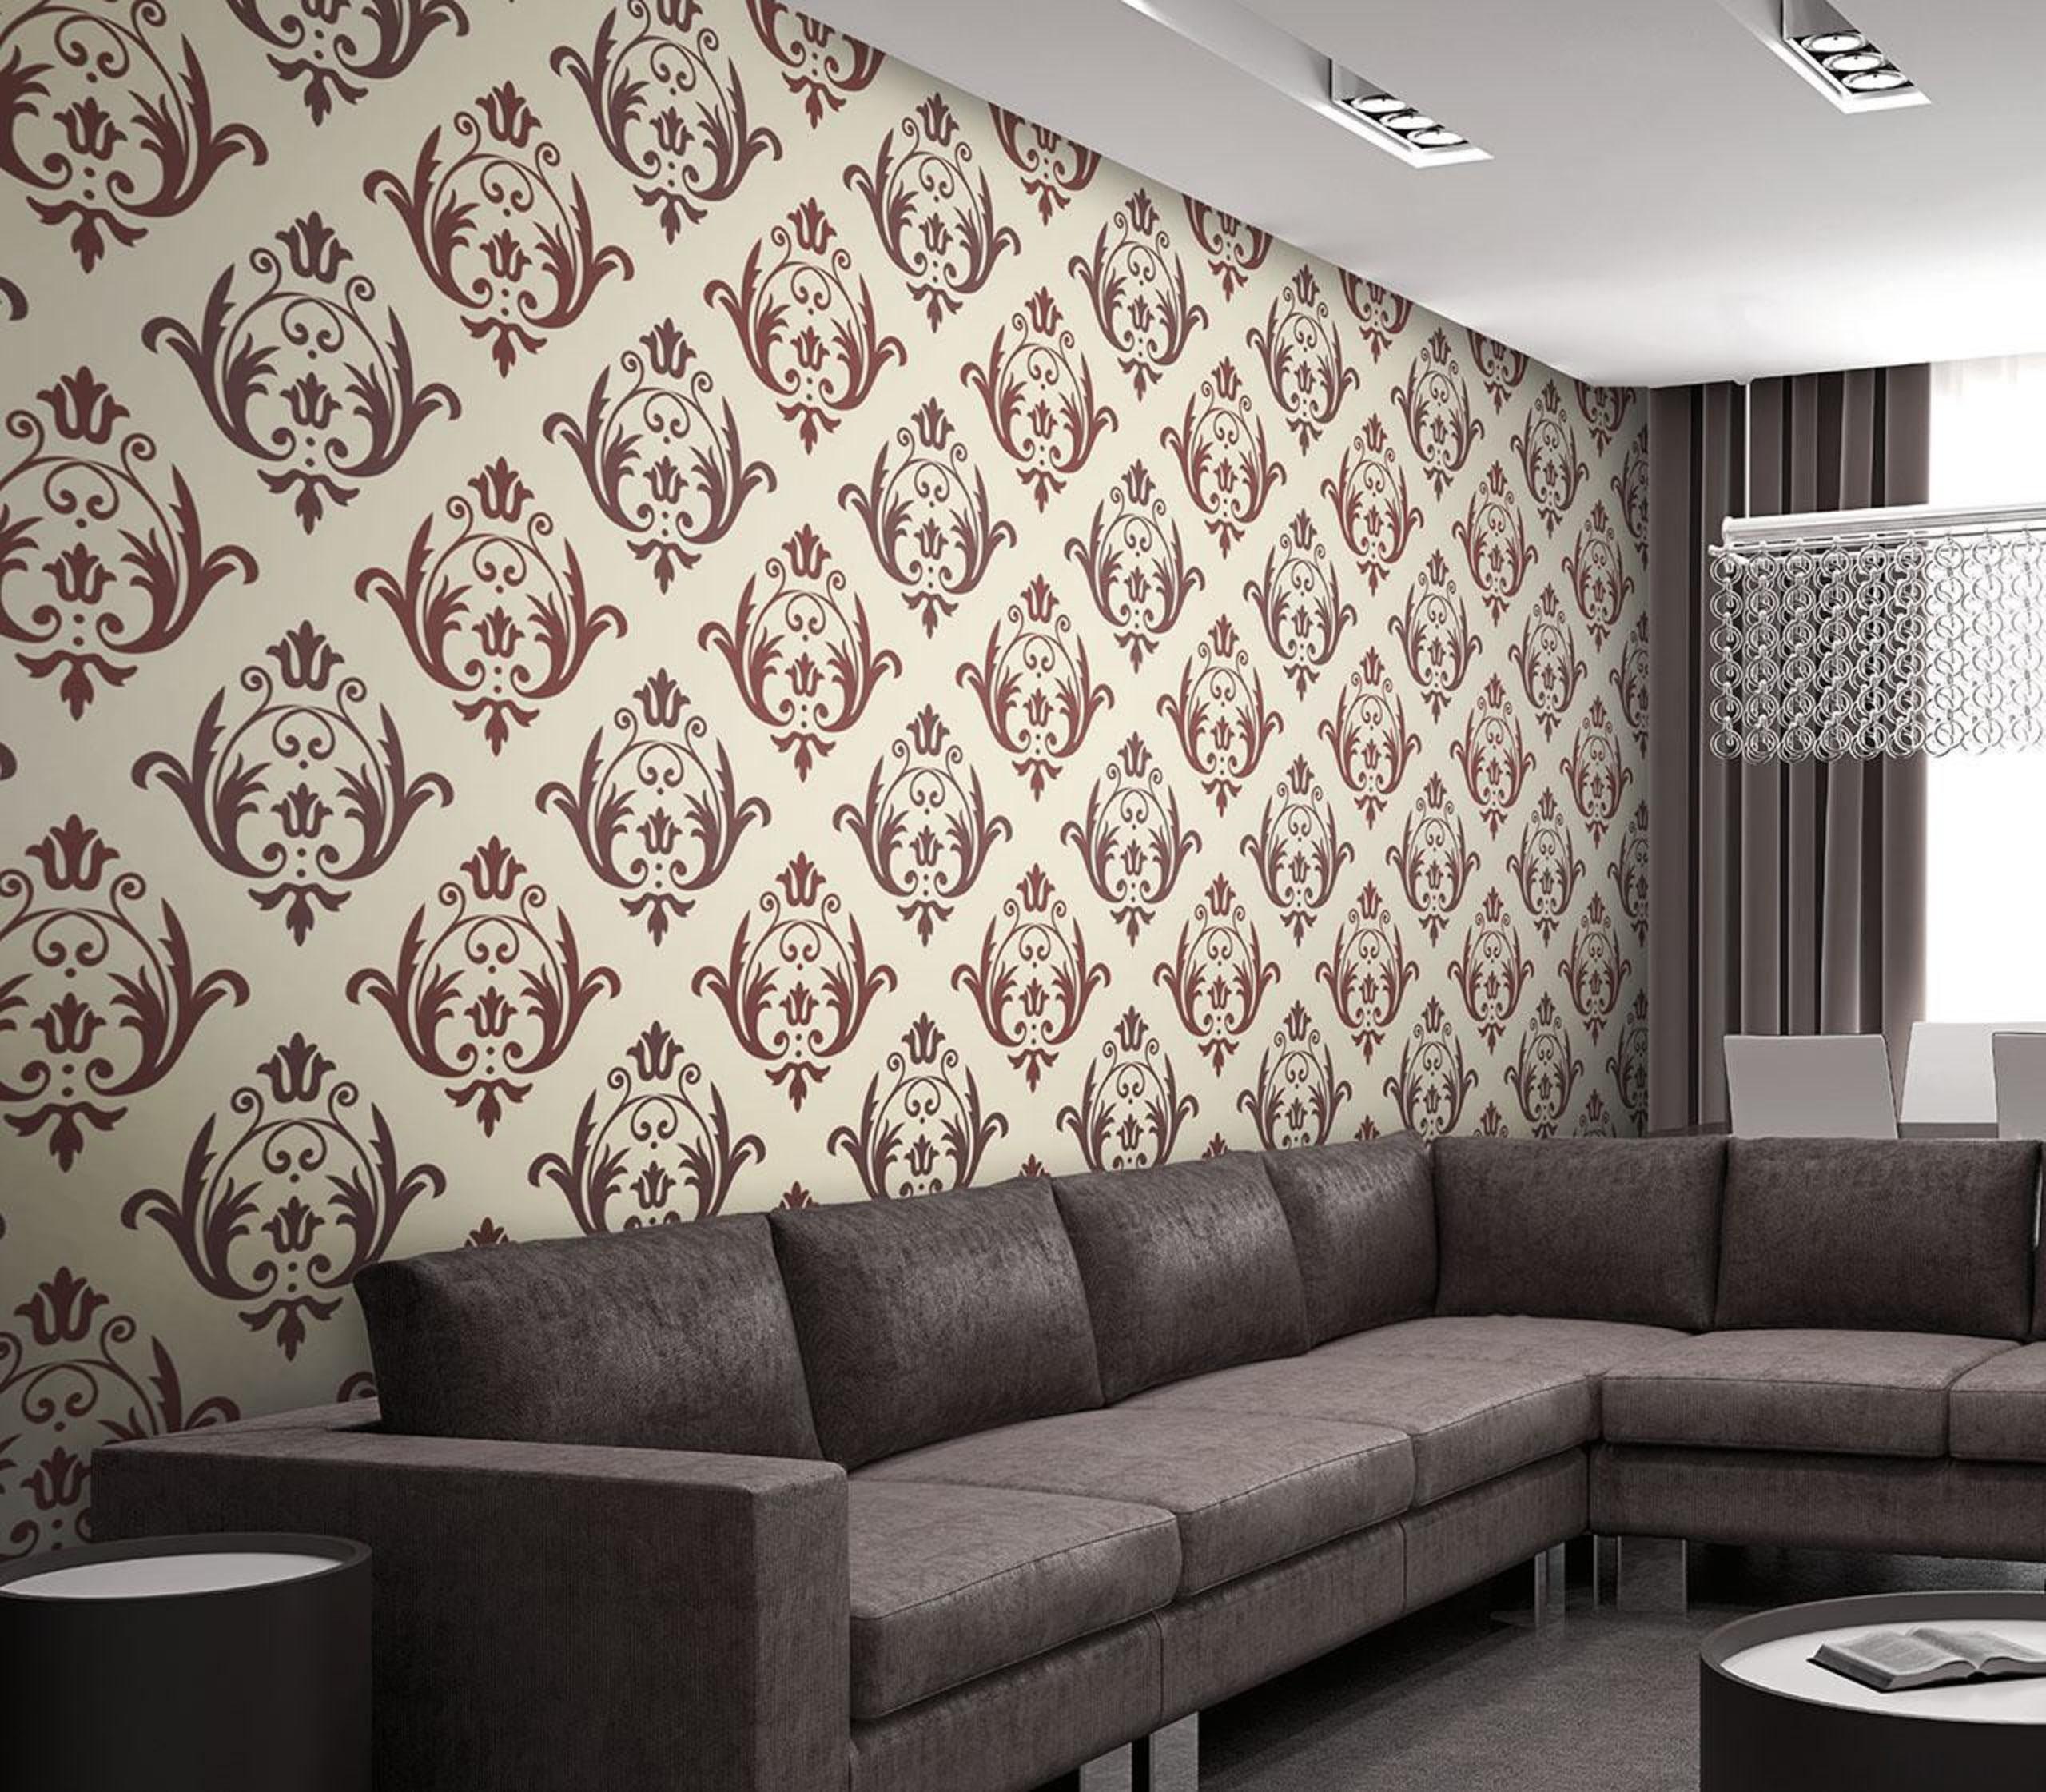 Aurora Range - Aurora Range - angle | angle, ceiling, couch, interior design, living room, pattern, wall, wallpaper, white, black